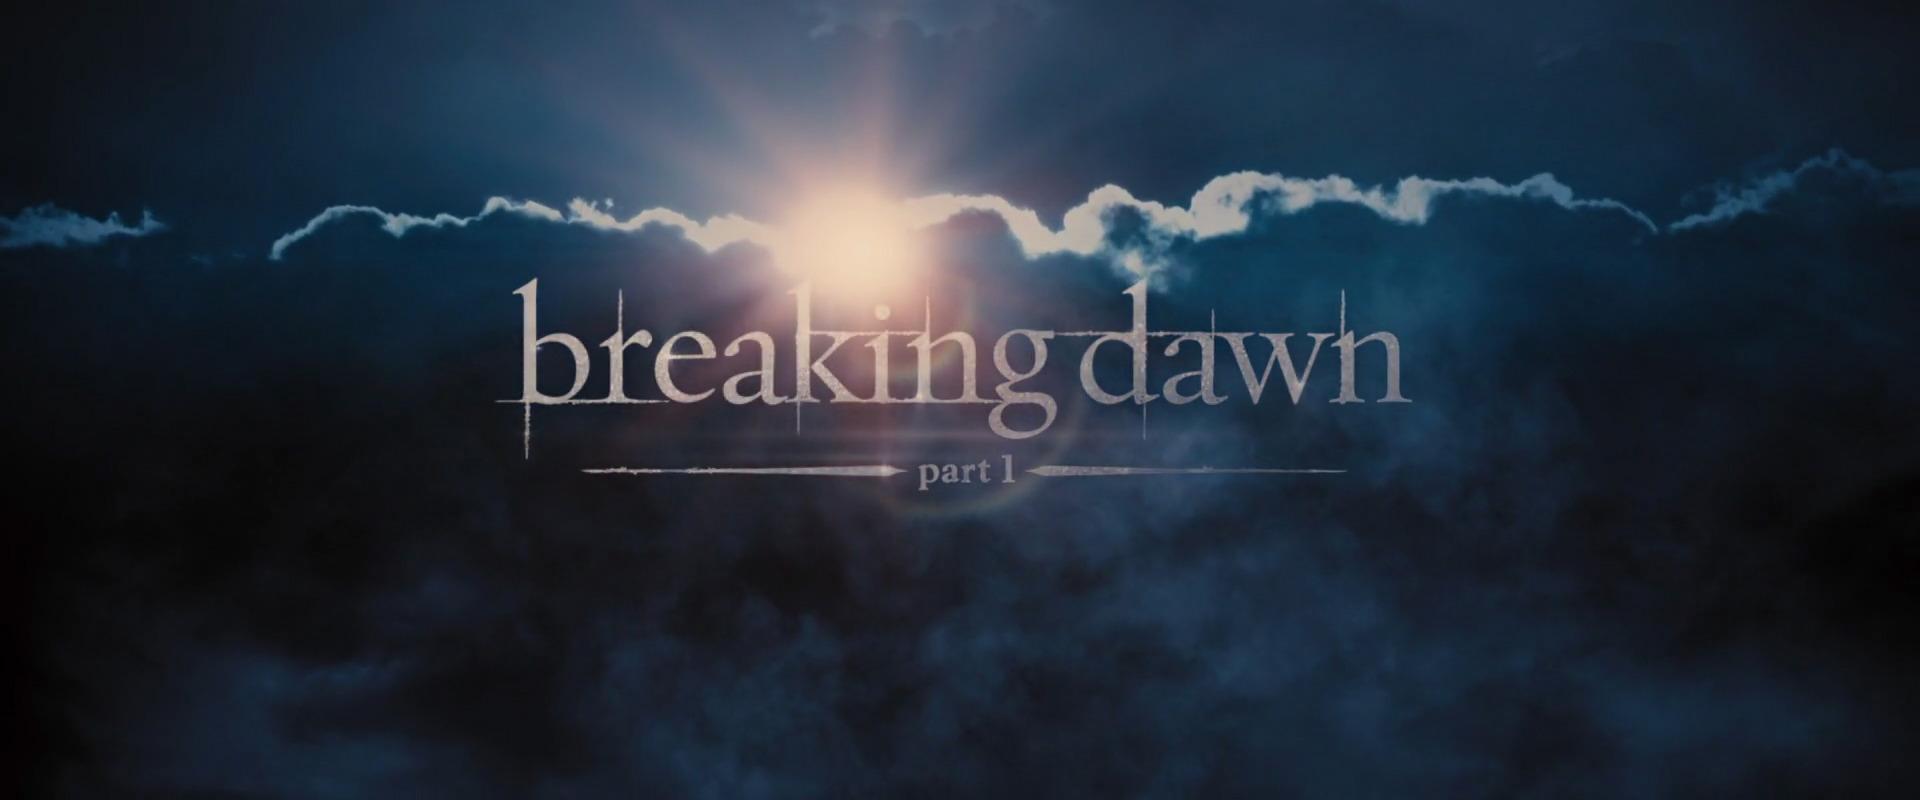 The Twilight Saga: Breaking Dawn - Part 1 (2011) - Movie